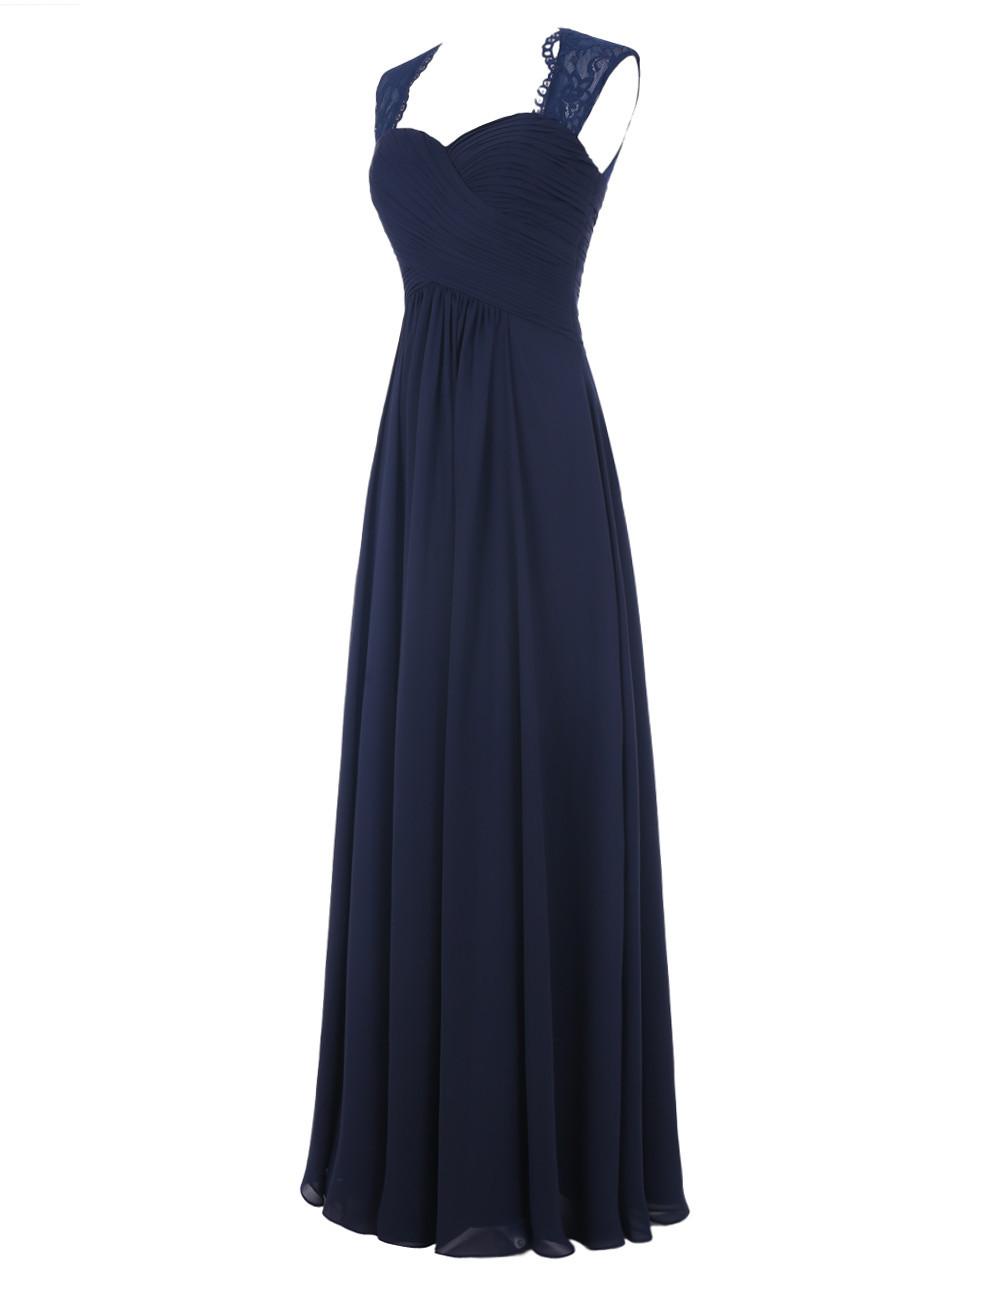 Simple A-line Sweetheart Sleeveless Chiffon Ruffles Long Navy Blue/Pink Prom Dress фото